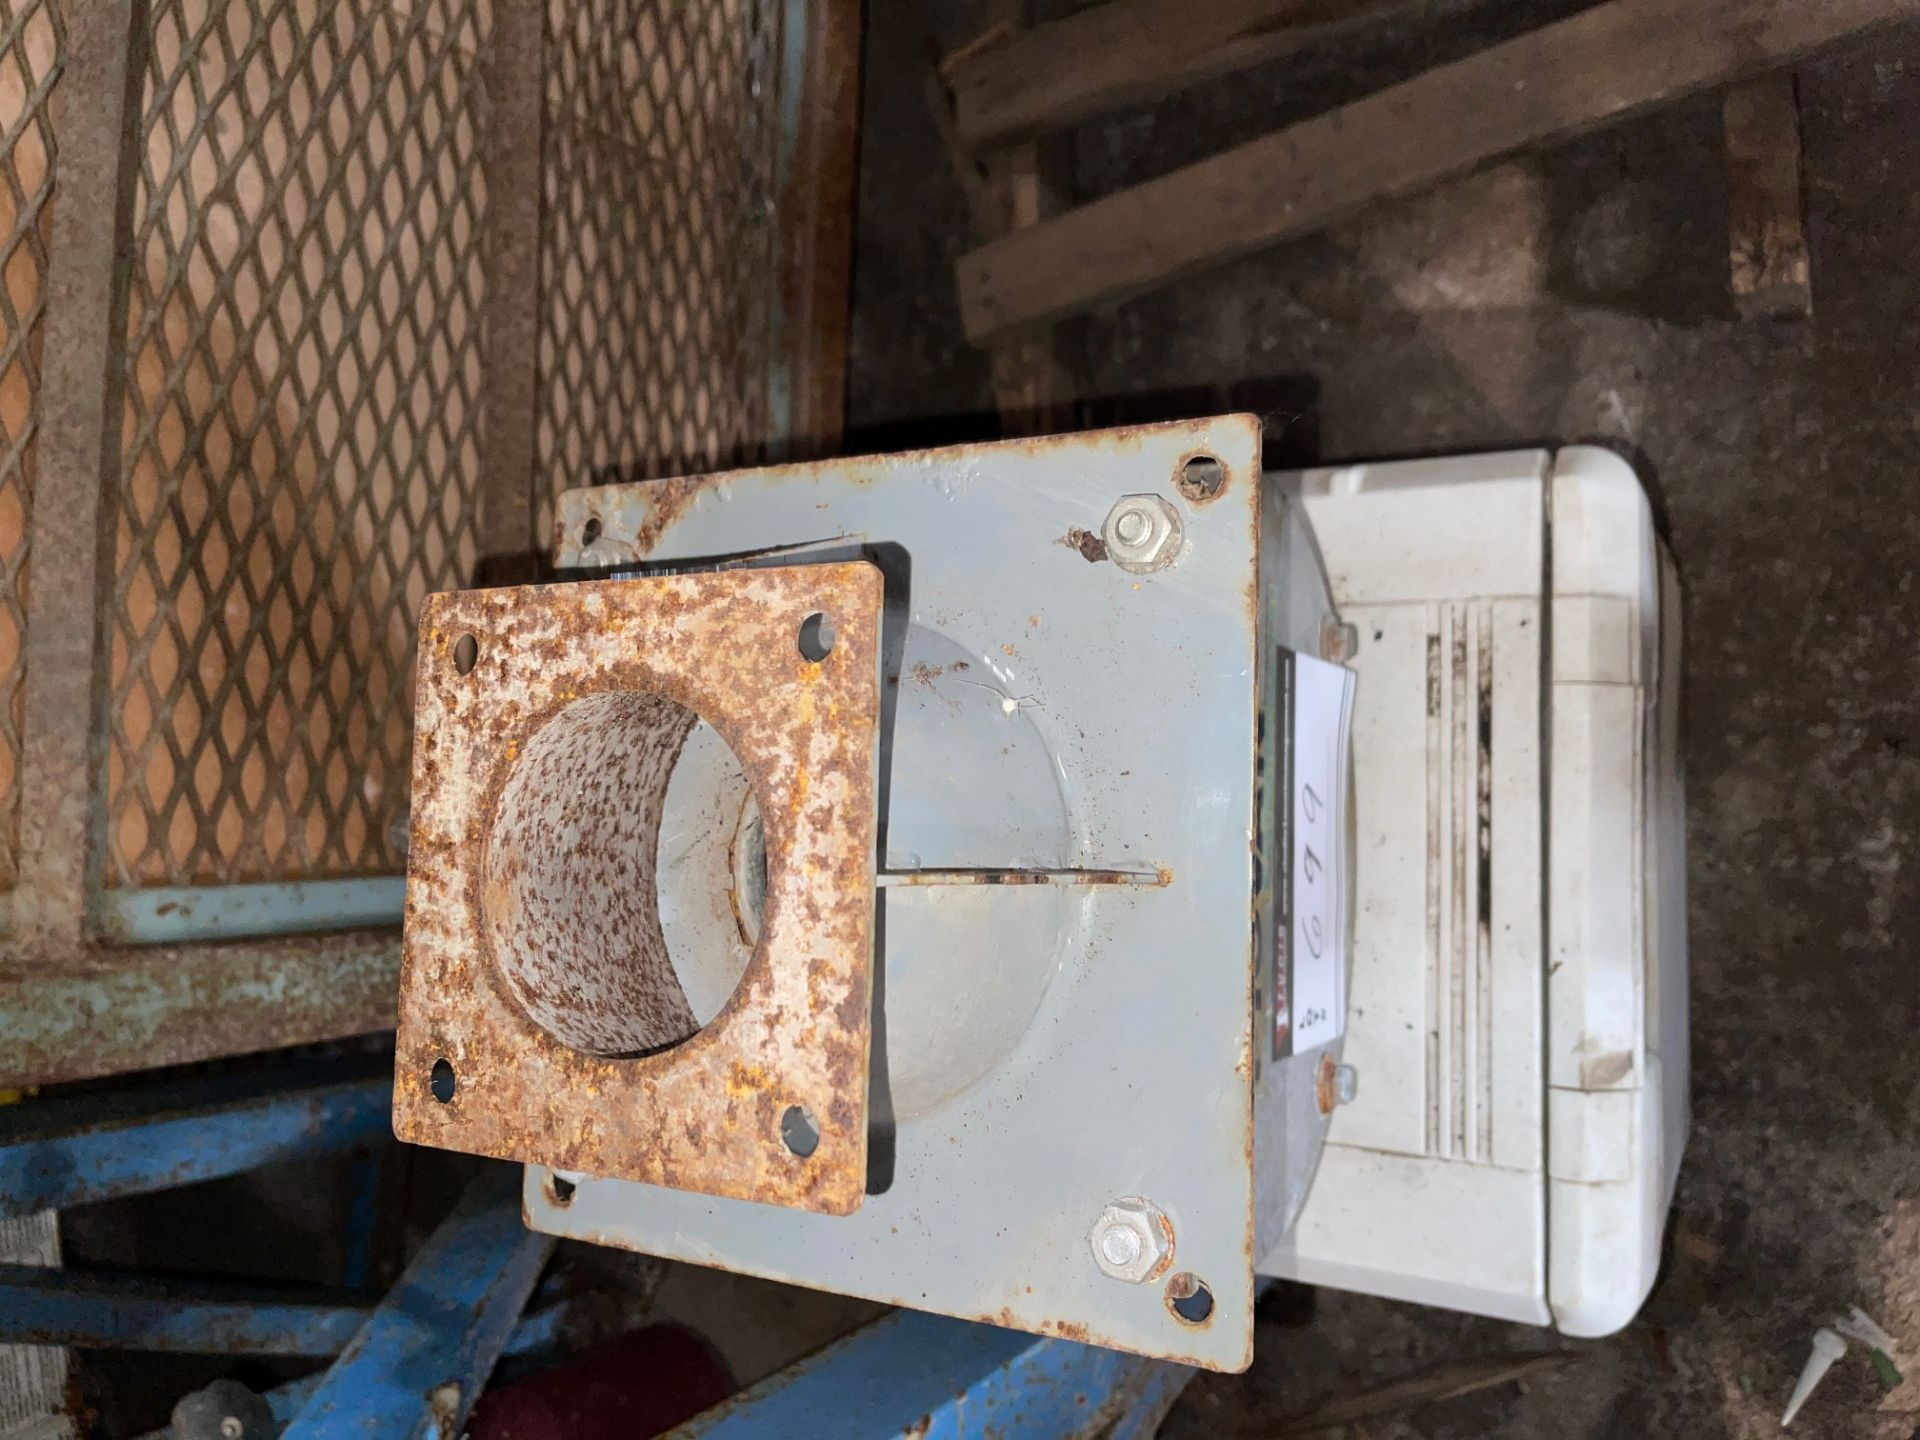 PIOVAN PLASTIC TECHNOLOGY AIR LOCK